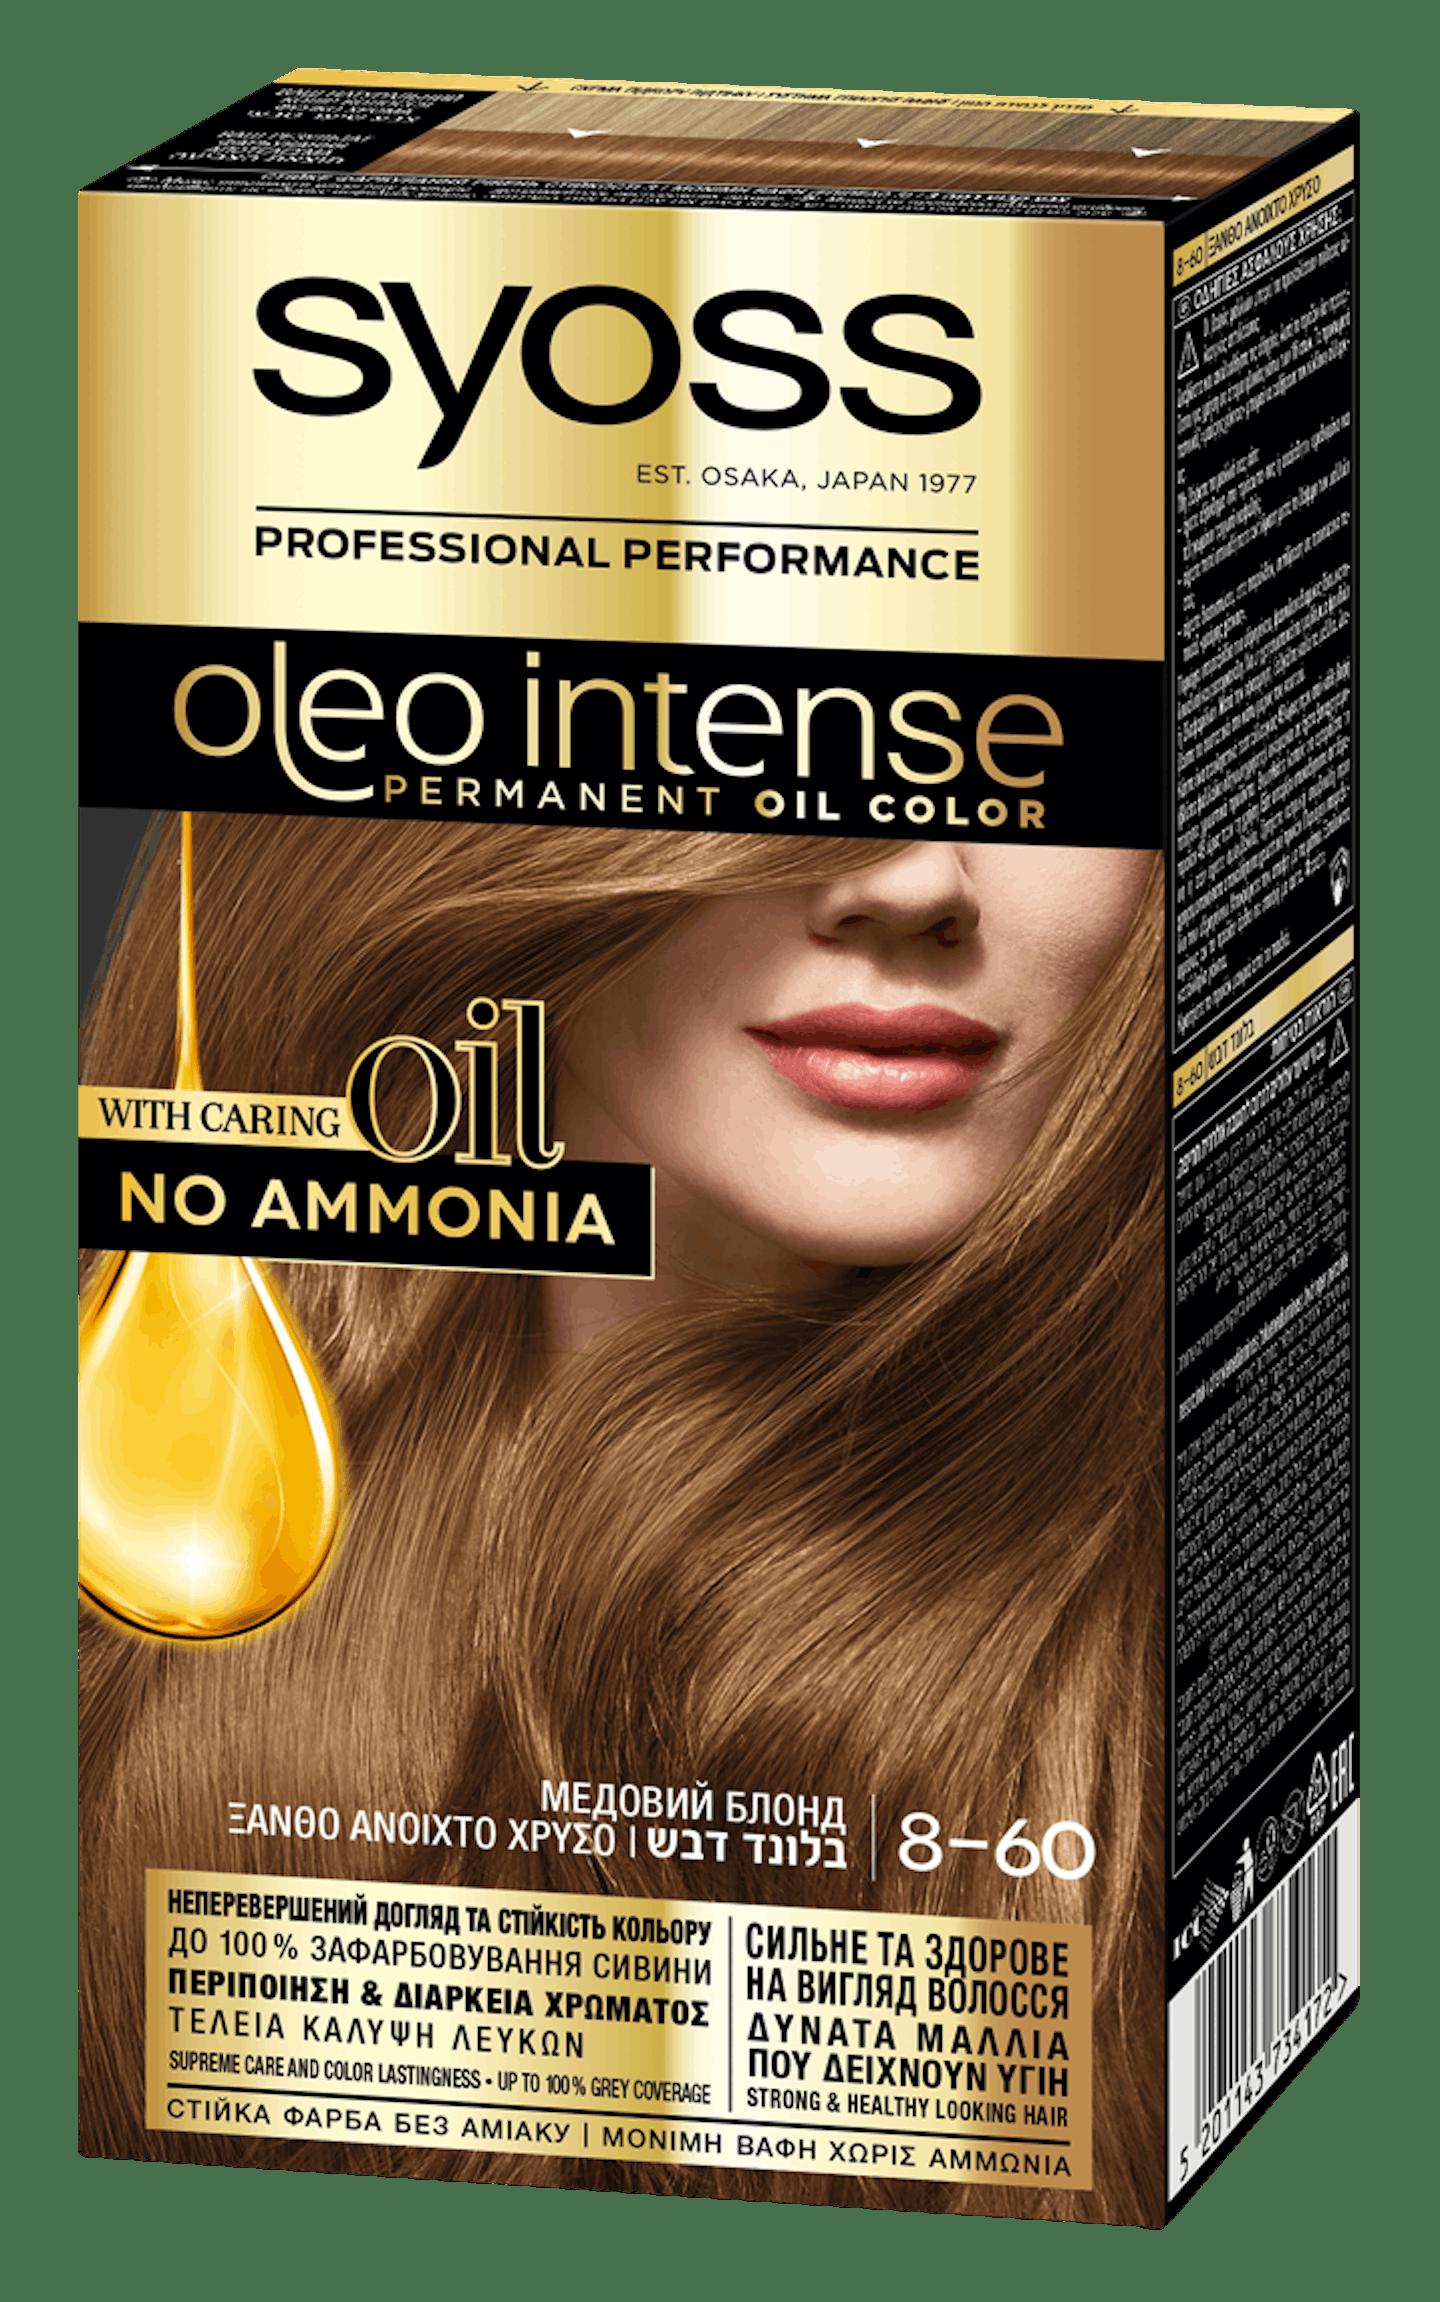 Syoss Oleo Intense Медовий Блонд 8-60